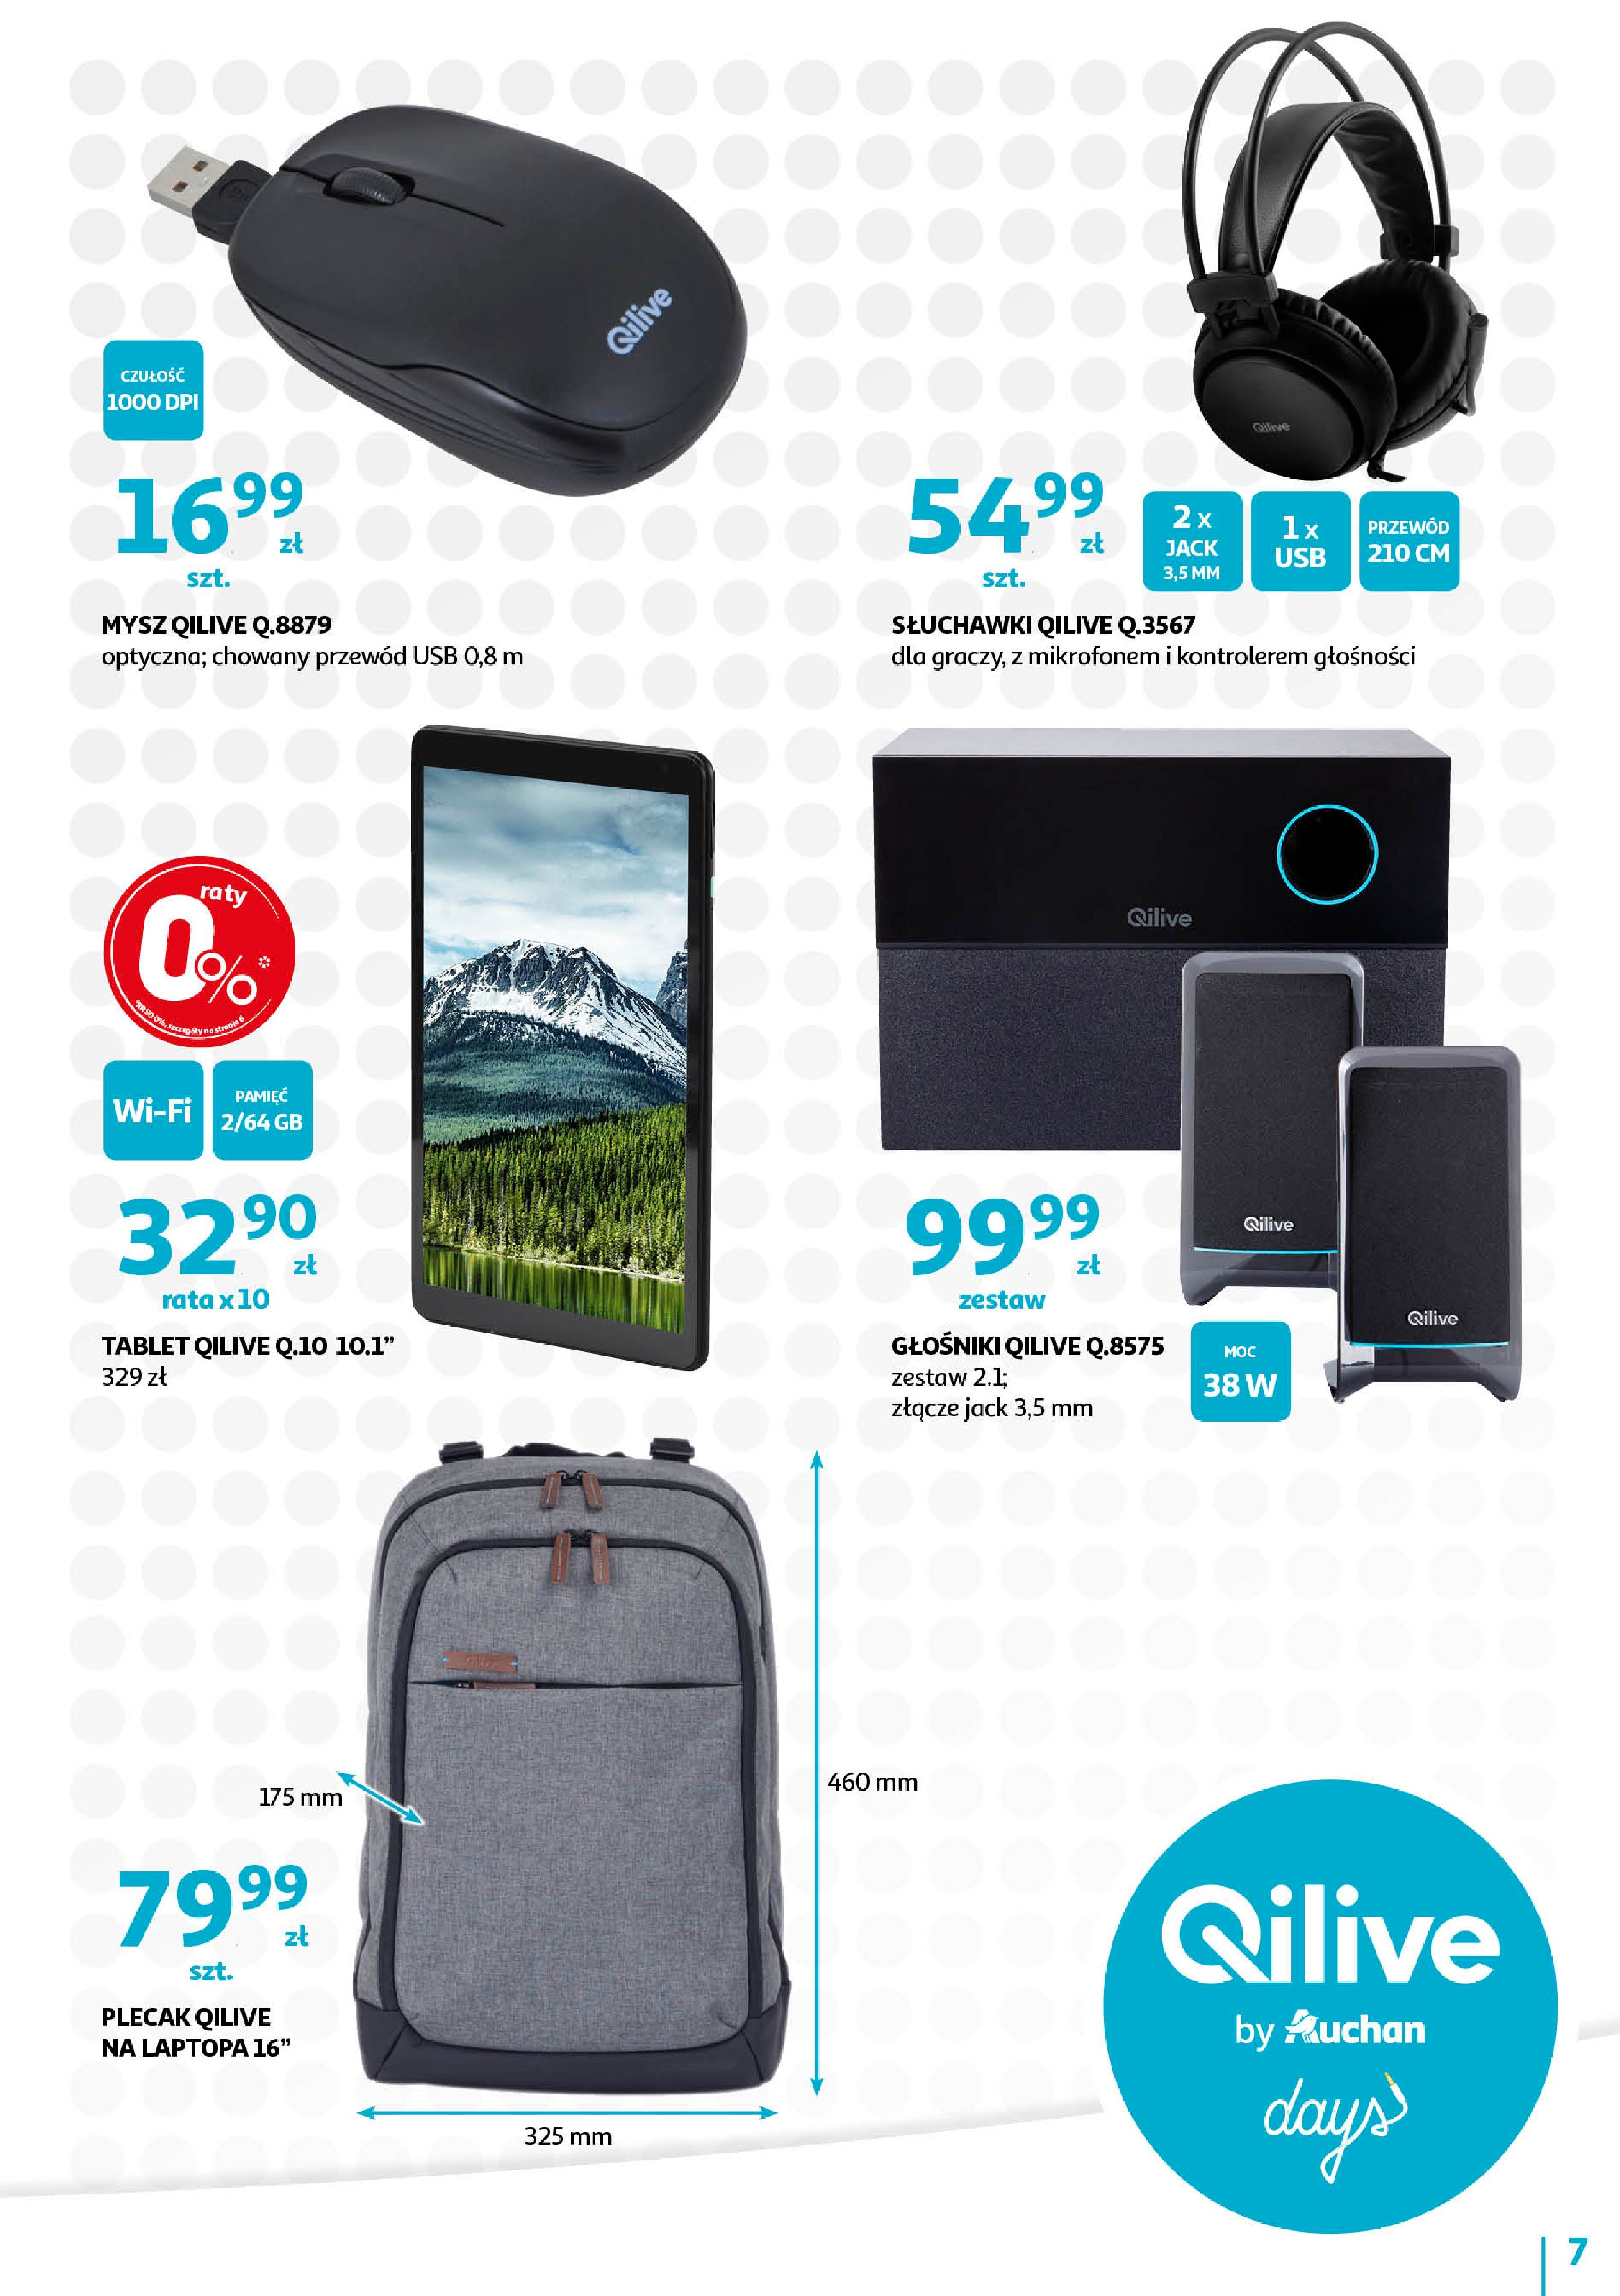 Gazetka Auchan - QILIVE byAuchan days  Hipermarkety-11.09.2019-21.09.2019-page-7